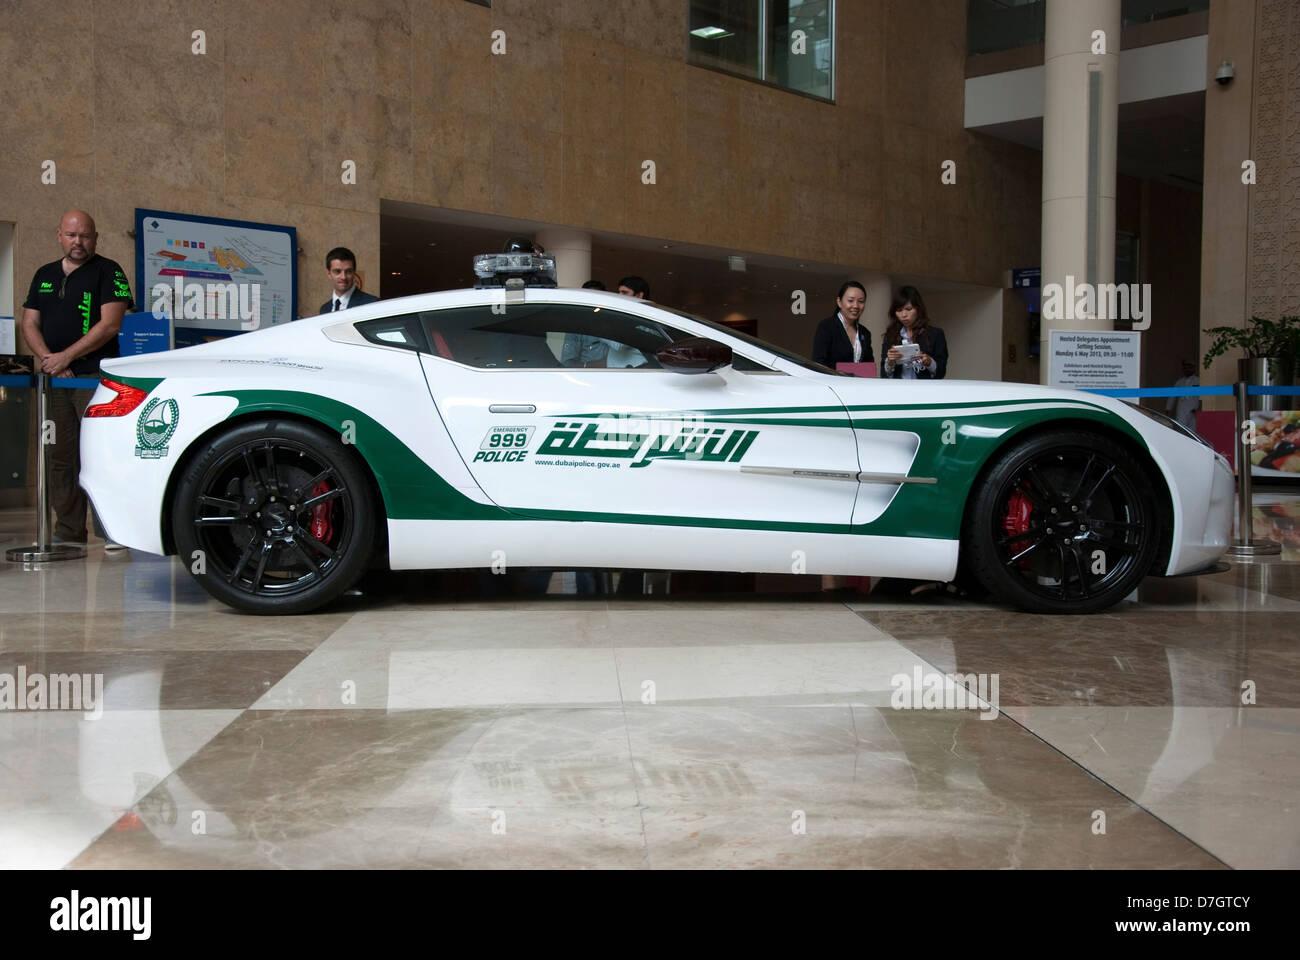 Dubai Police Aston Martin One77 Coupe Patrol Car Stock Photo Alamy